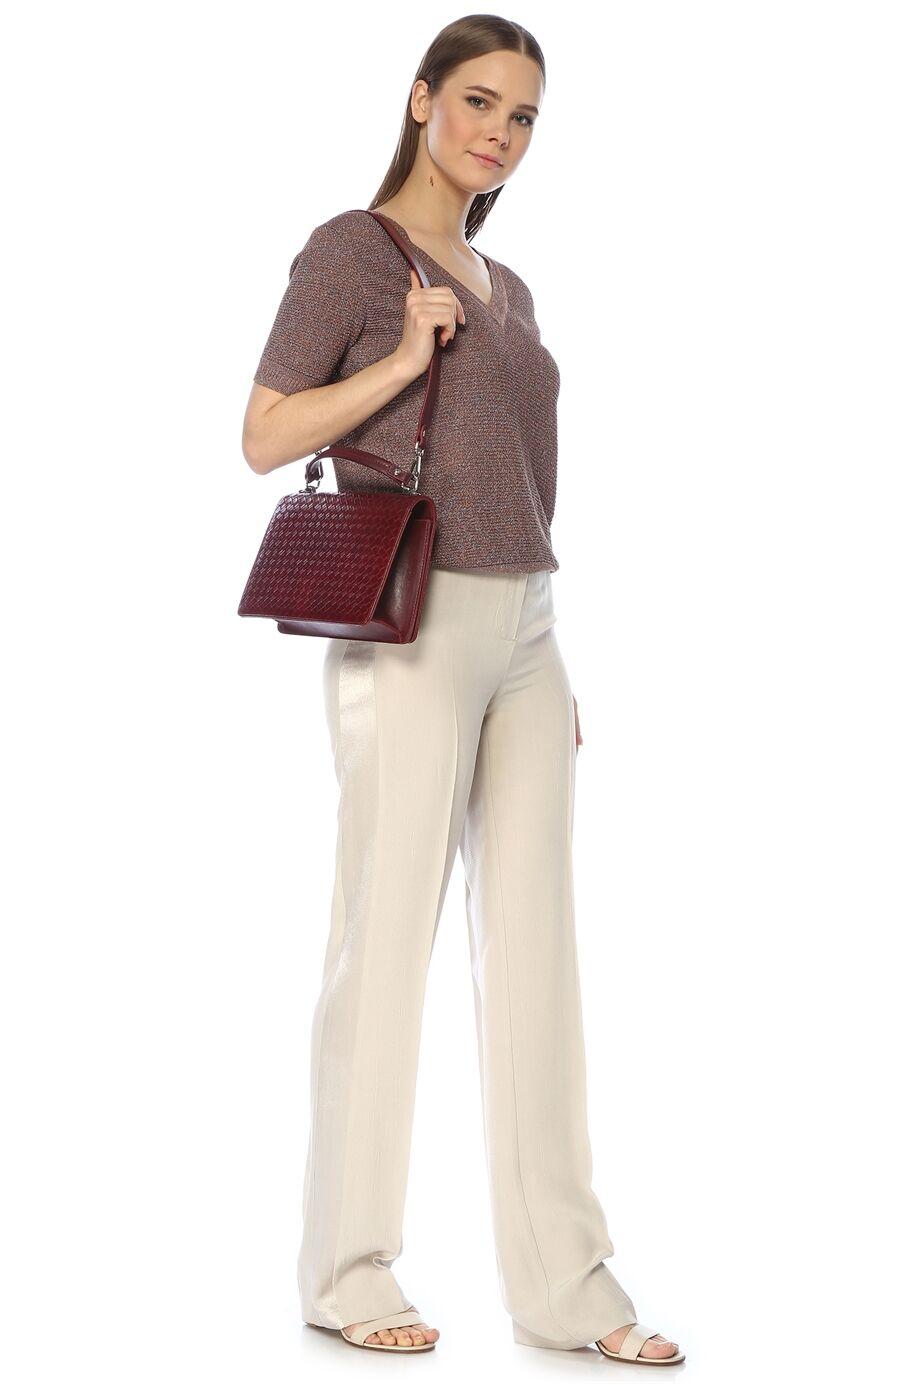 Örgü Bordo Kadın Çanta